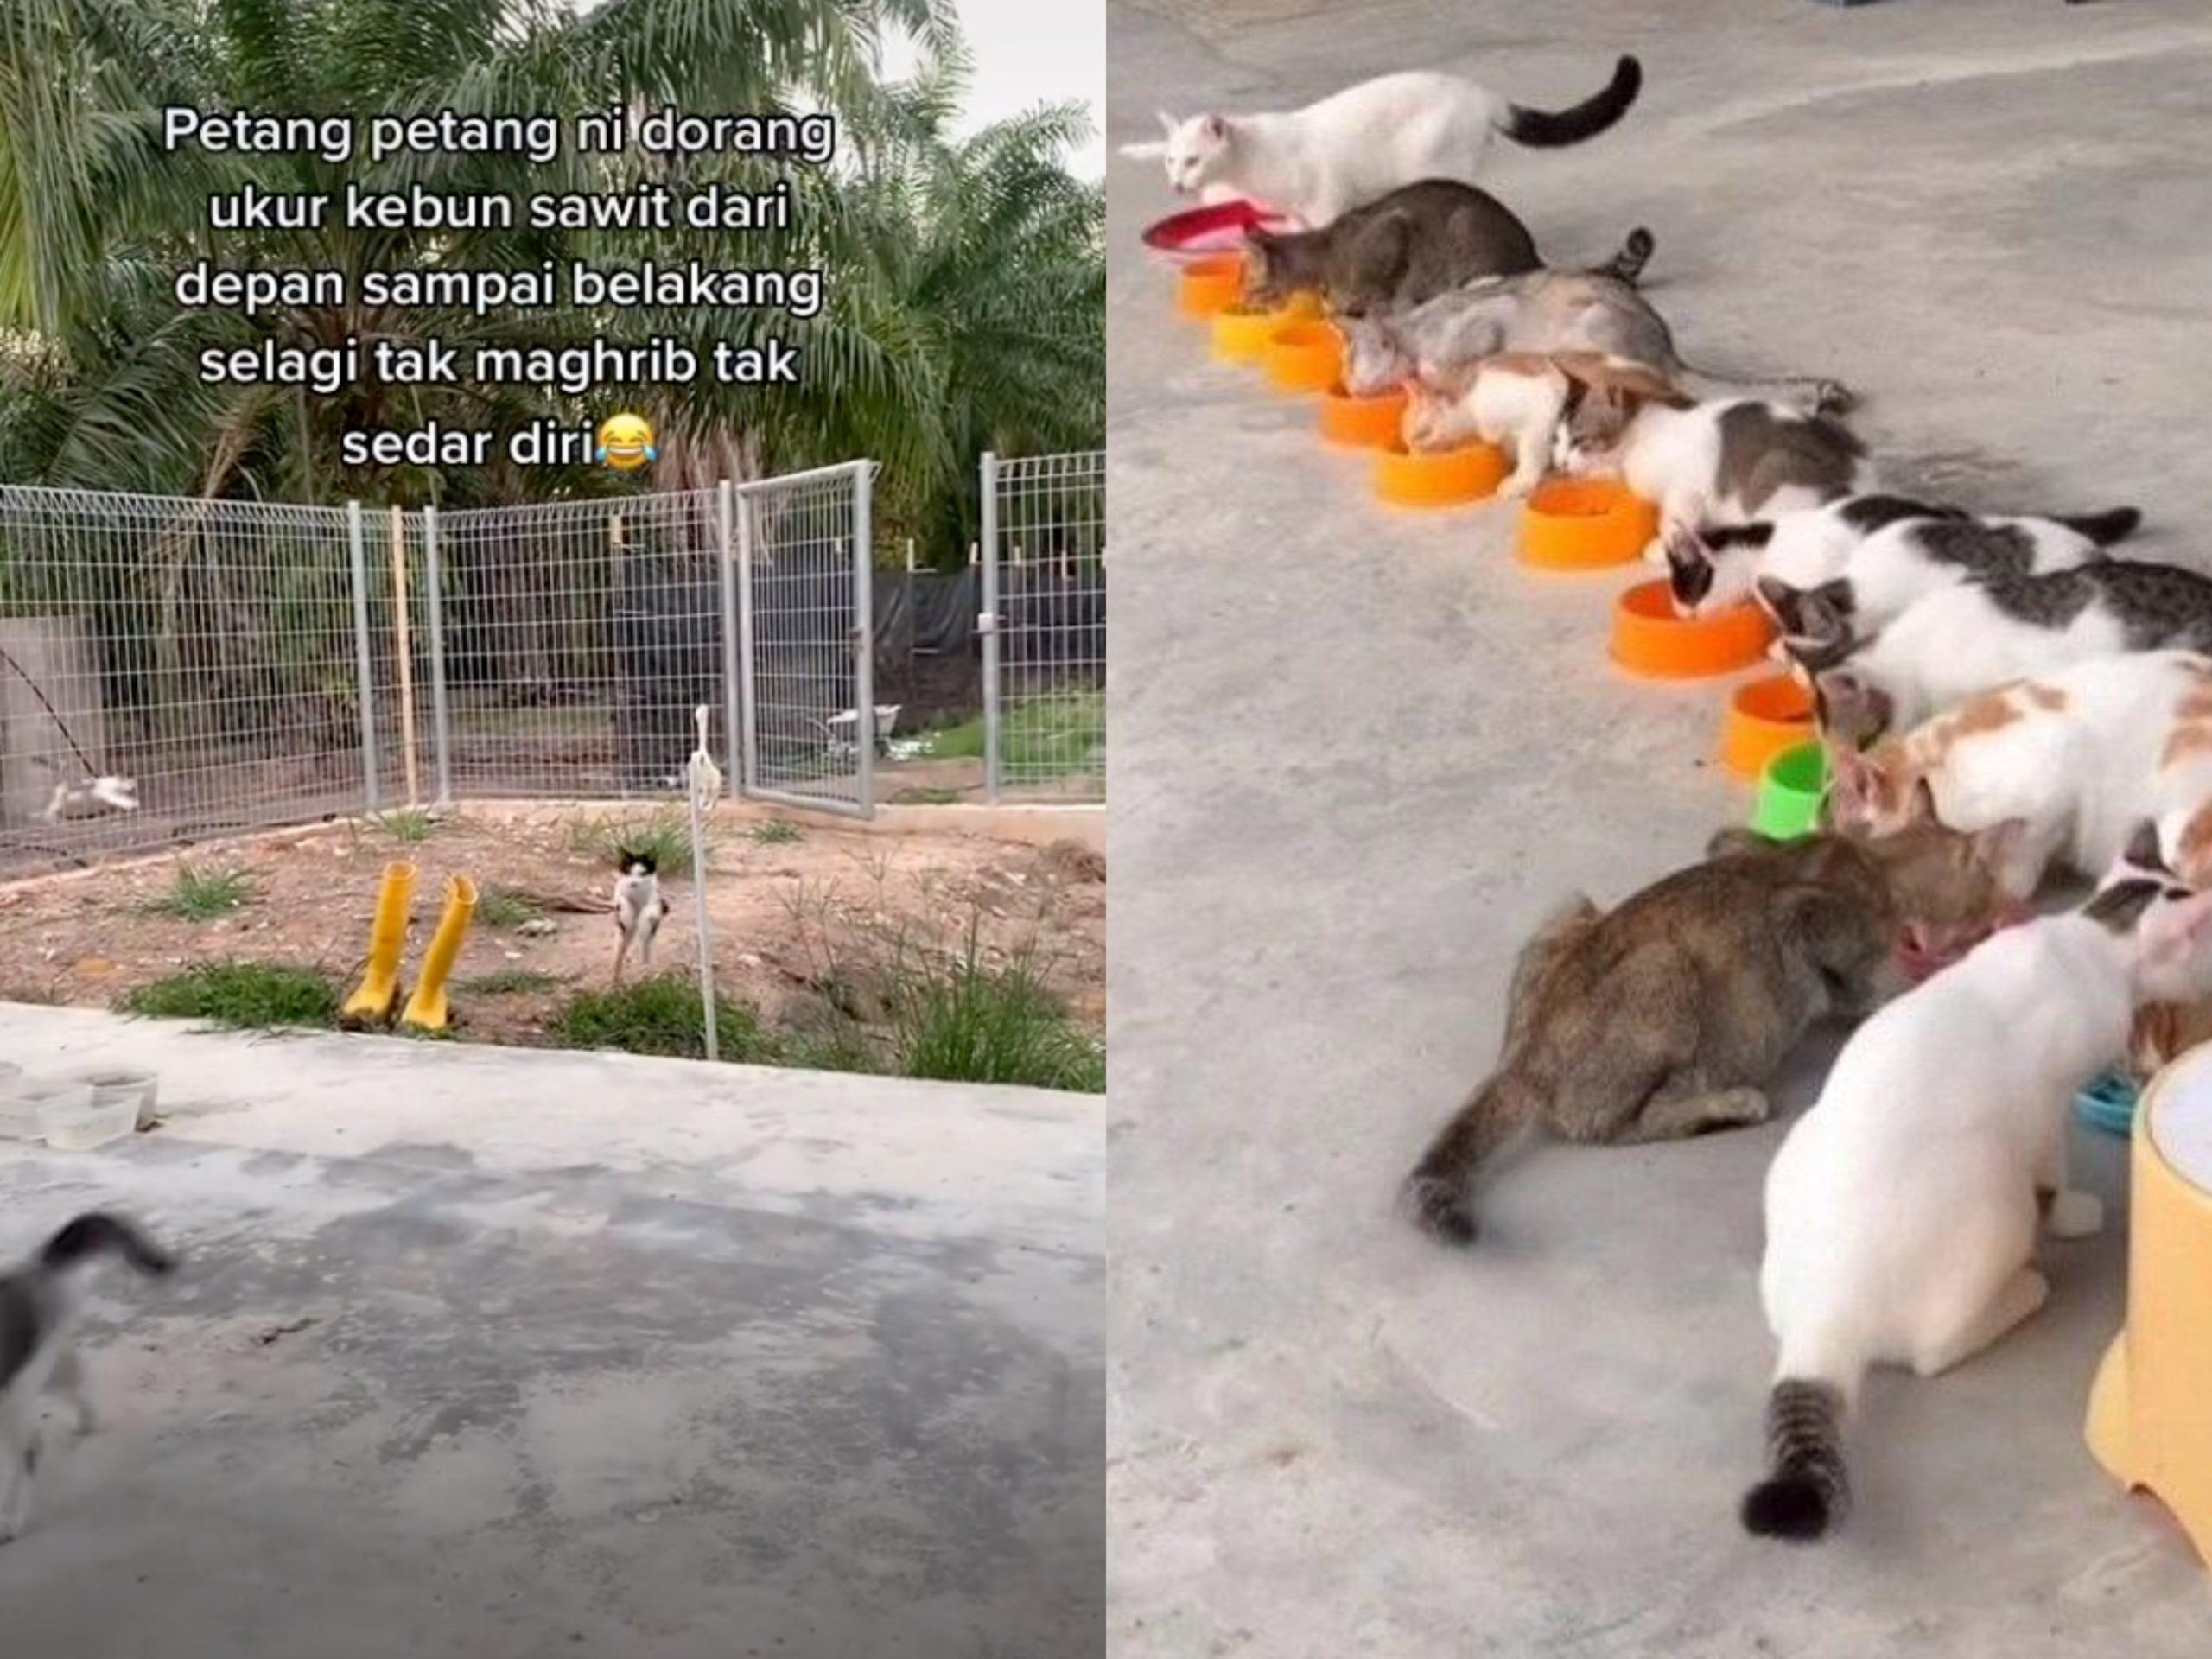 Ingatkan Seekor Kucing Je Yang Datang! Sekali Berpusu-pusu Siap Beratur!